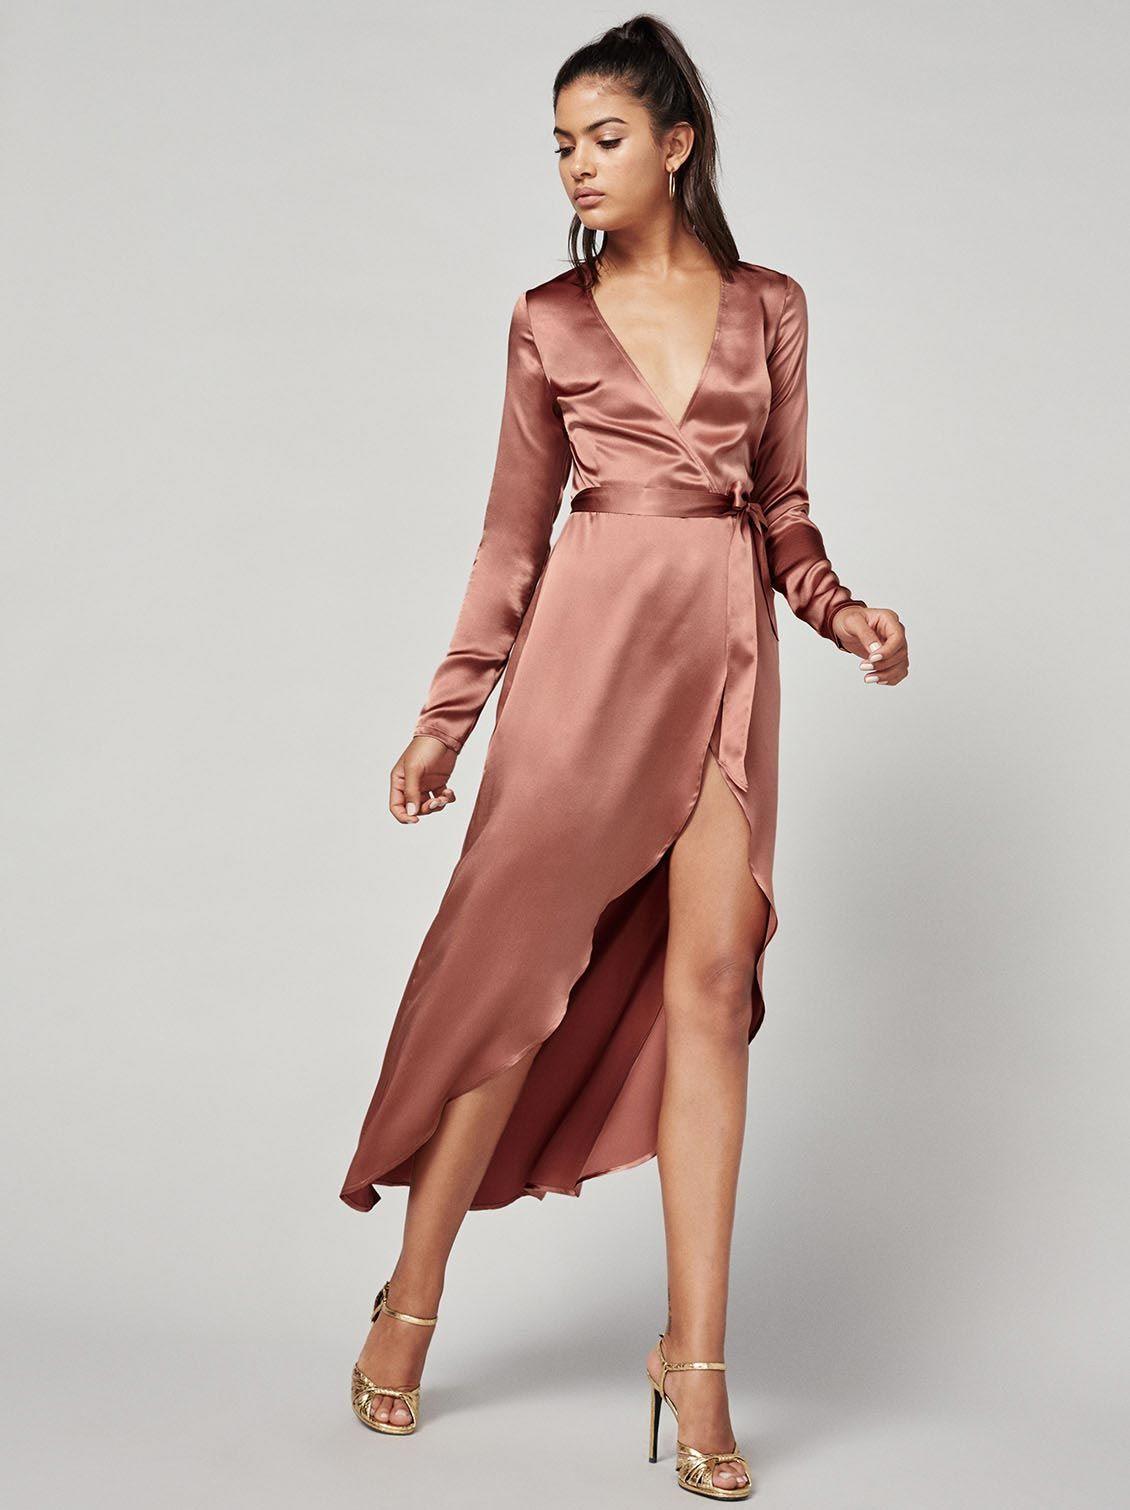 021015884886b3 Marni dress praline 1 clp | To Buy in 2019 | Dresses, Marni dress ...